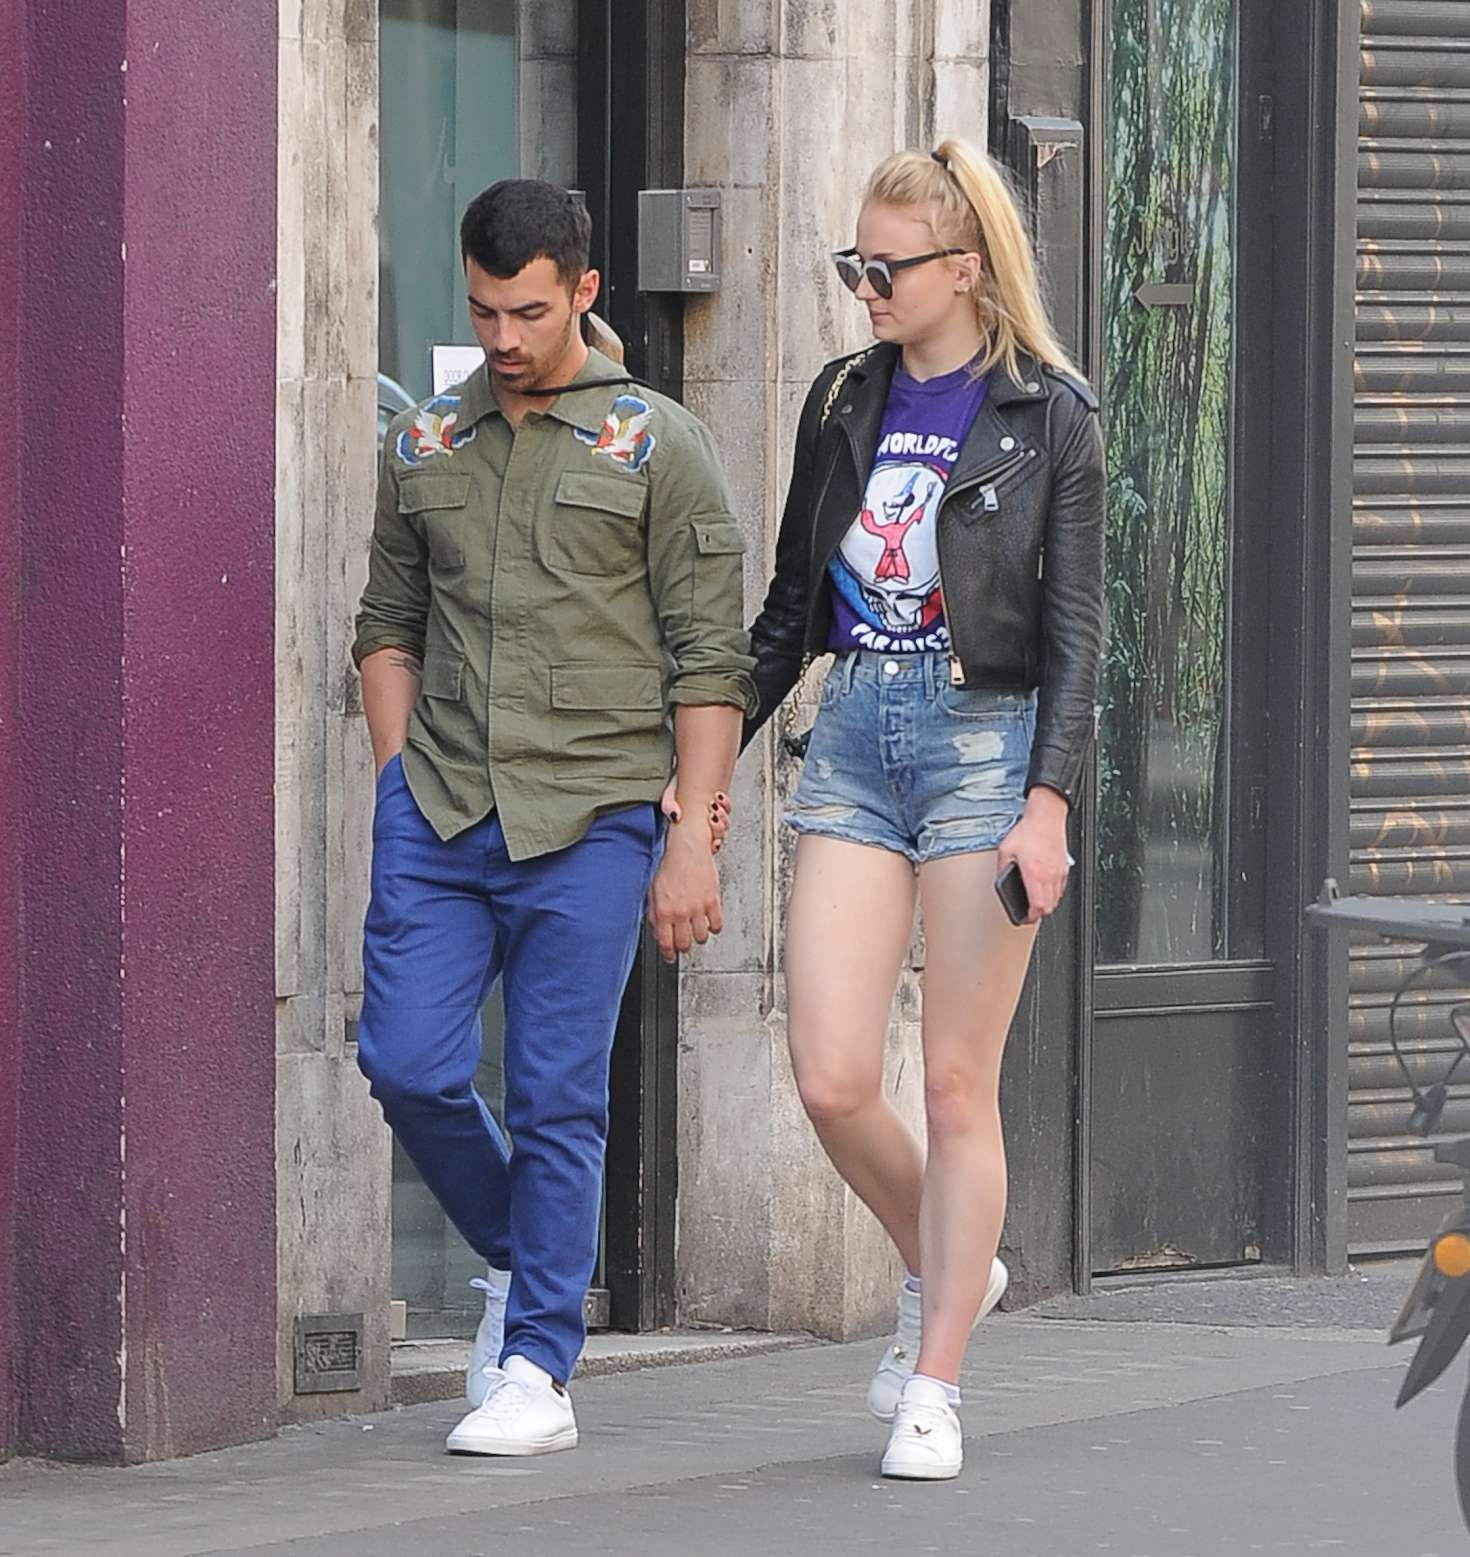 Sophie Turner and Joe Jonas at The Ivy Soho Brasserie in London